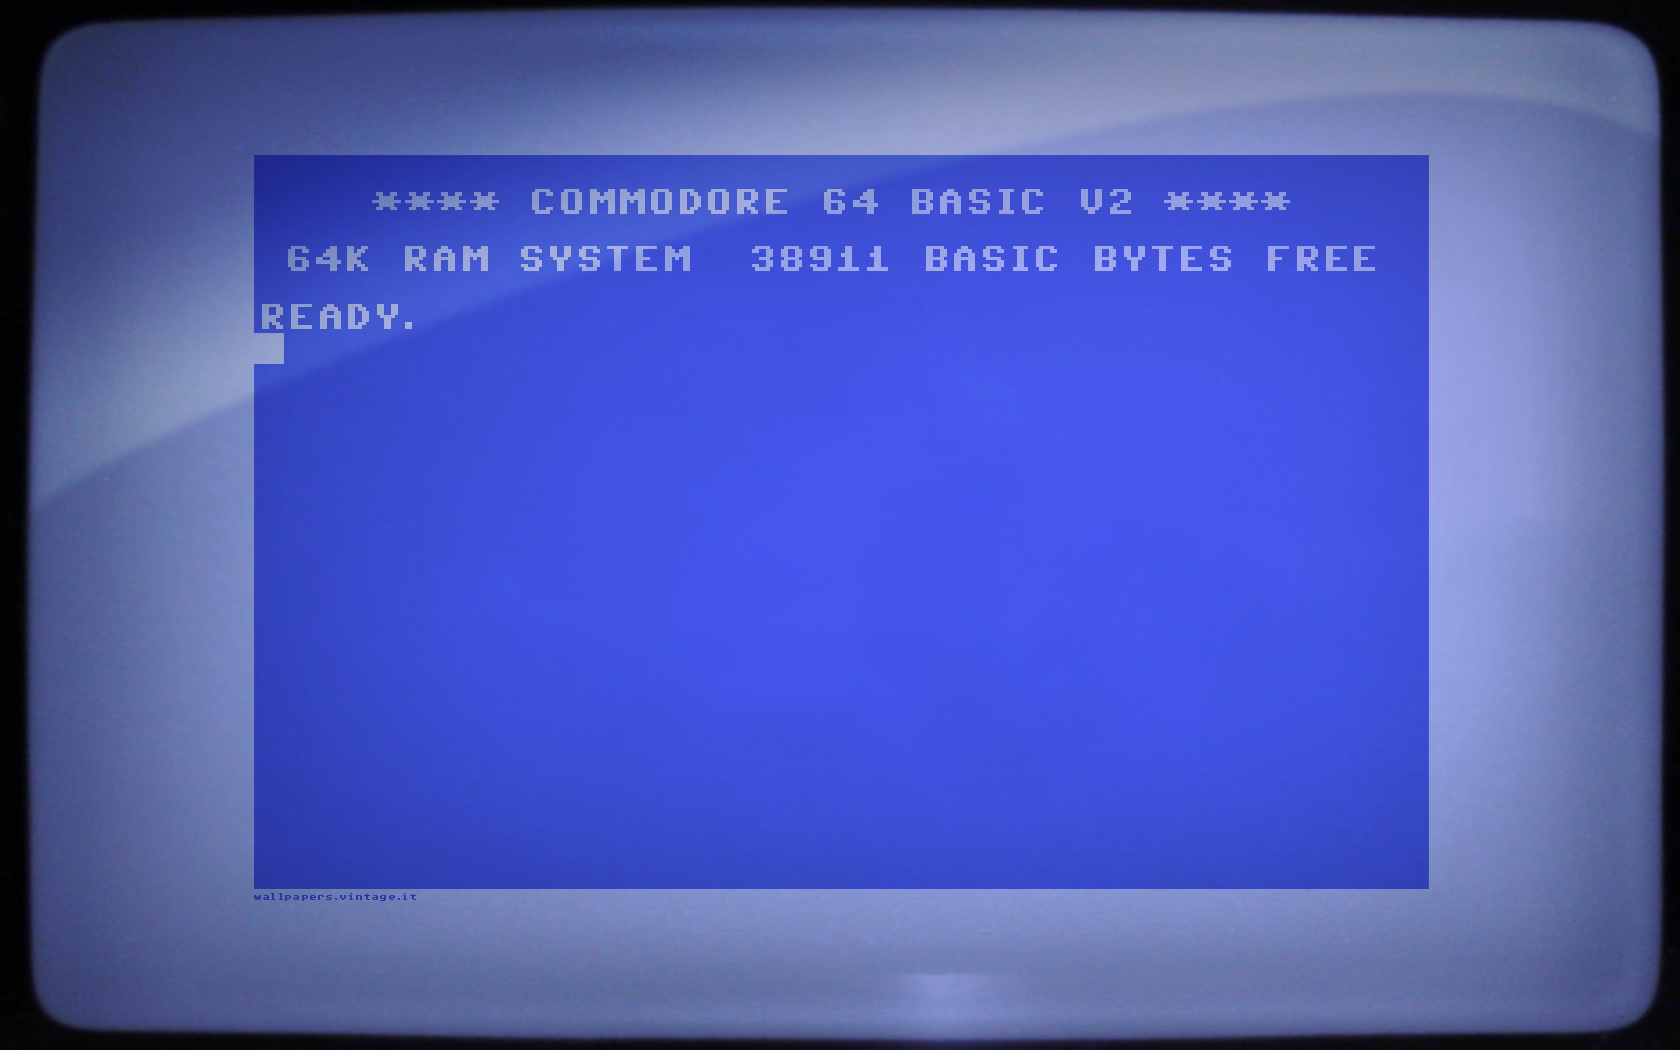 Best 56 Commodore 64 Wallpaper on HipWallpaper Donkey Kong 64 1680x1050